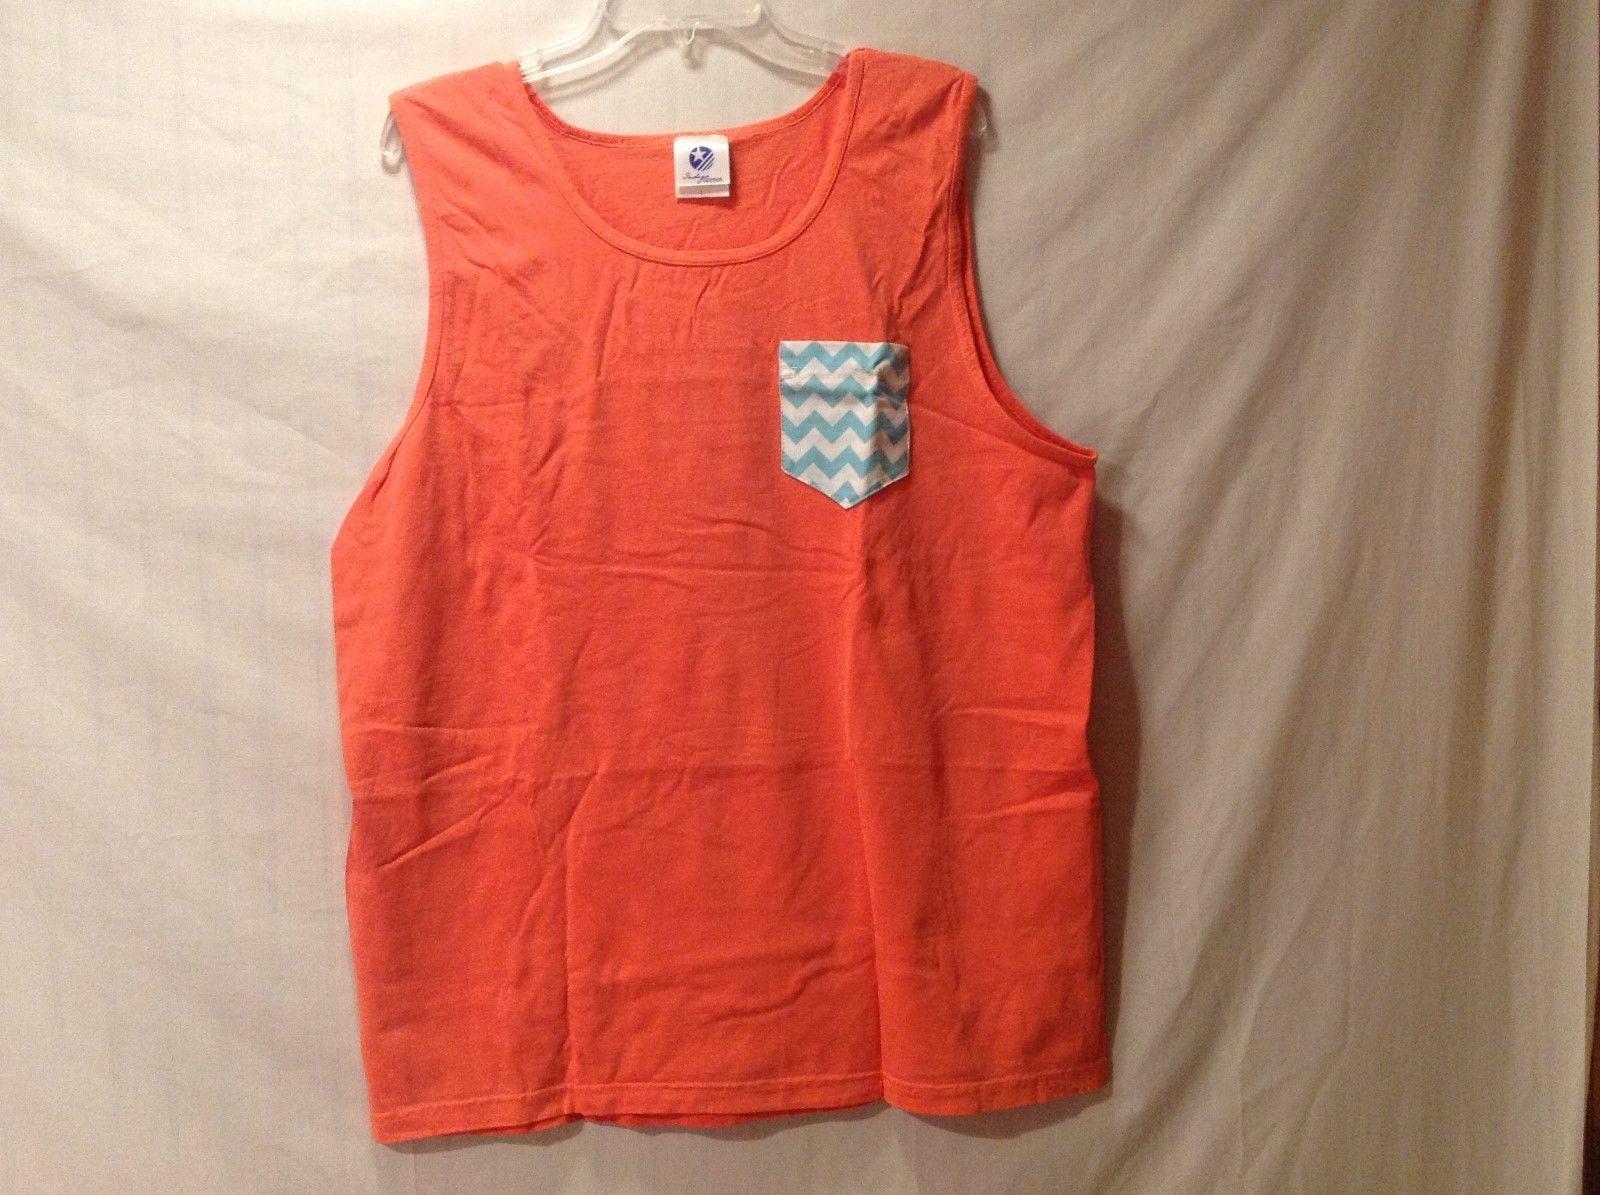 Indigo Cotton Sherbert Orange T-shirt Sleeveless Tank Size Large